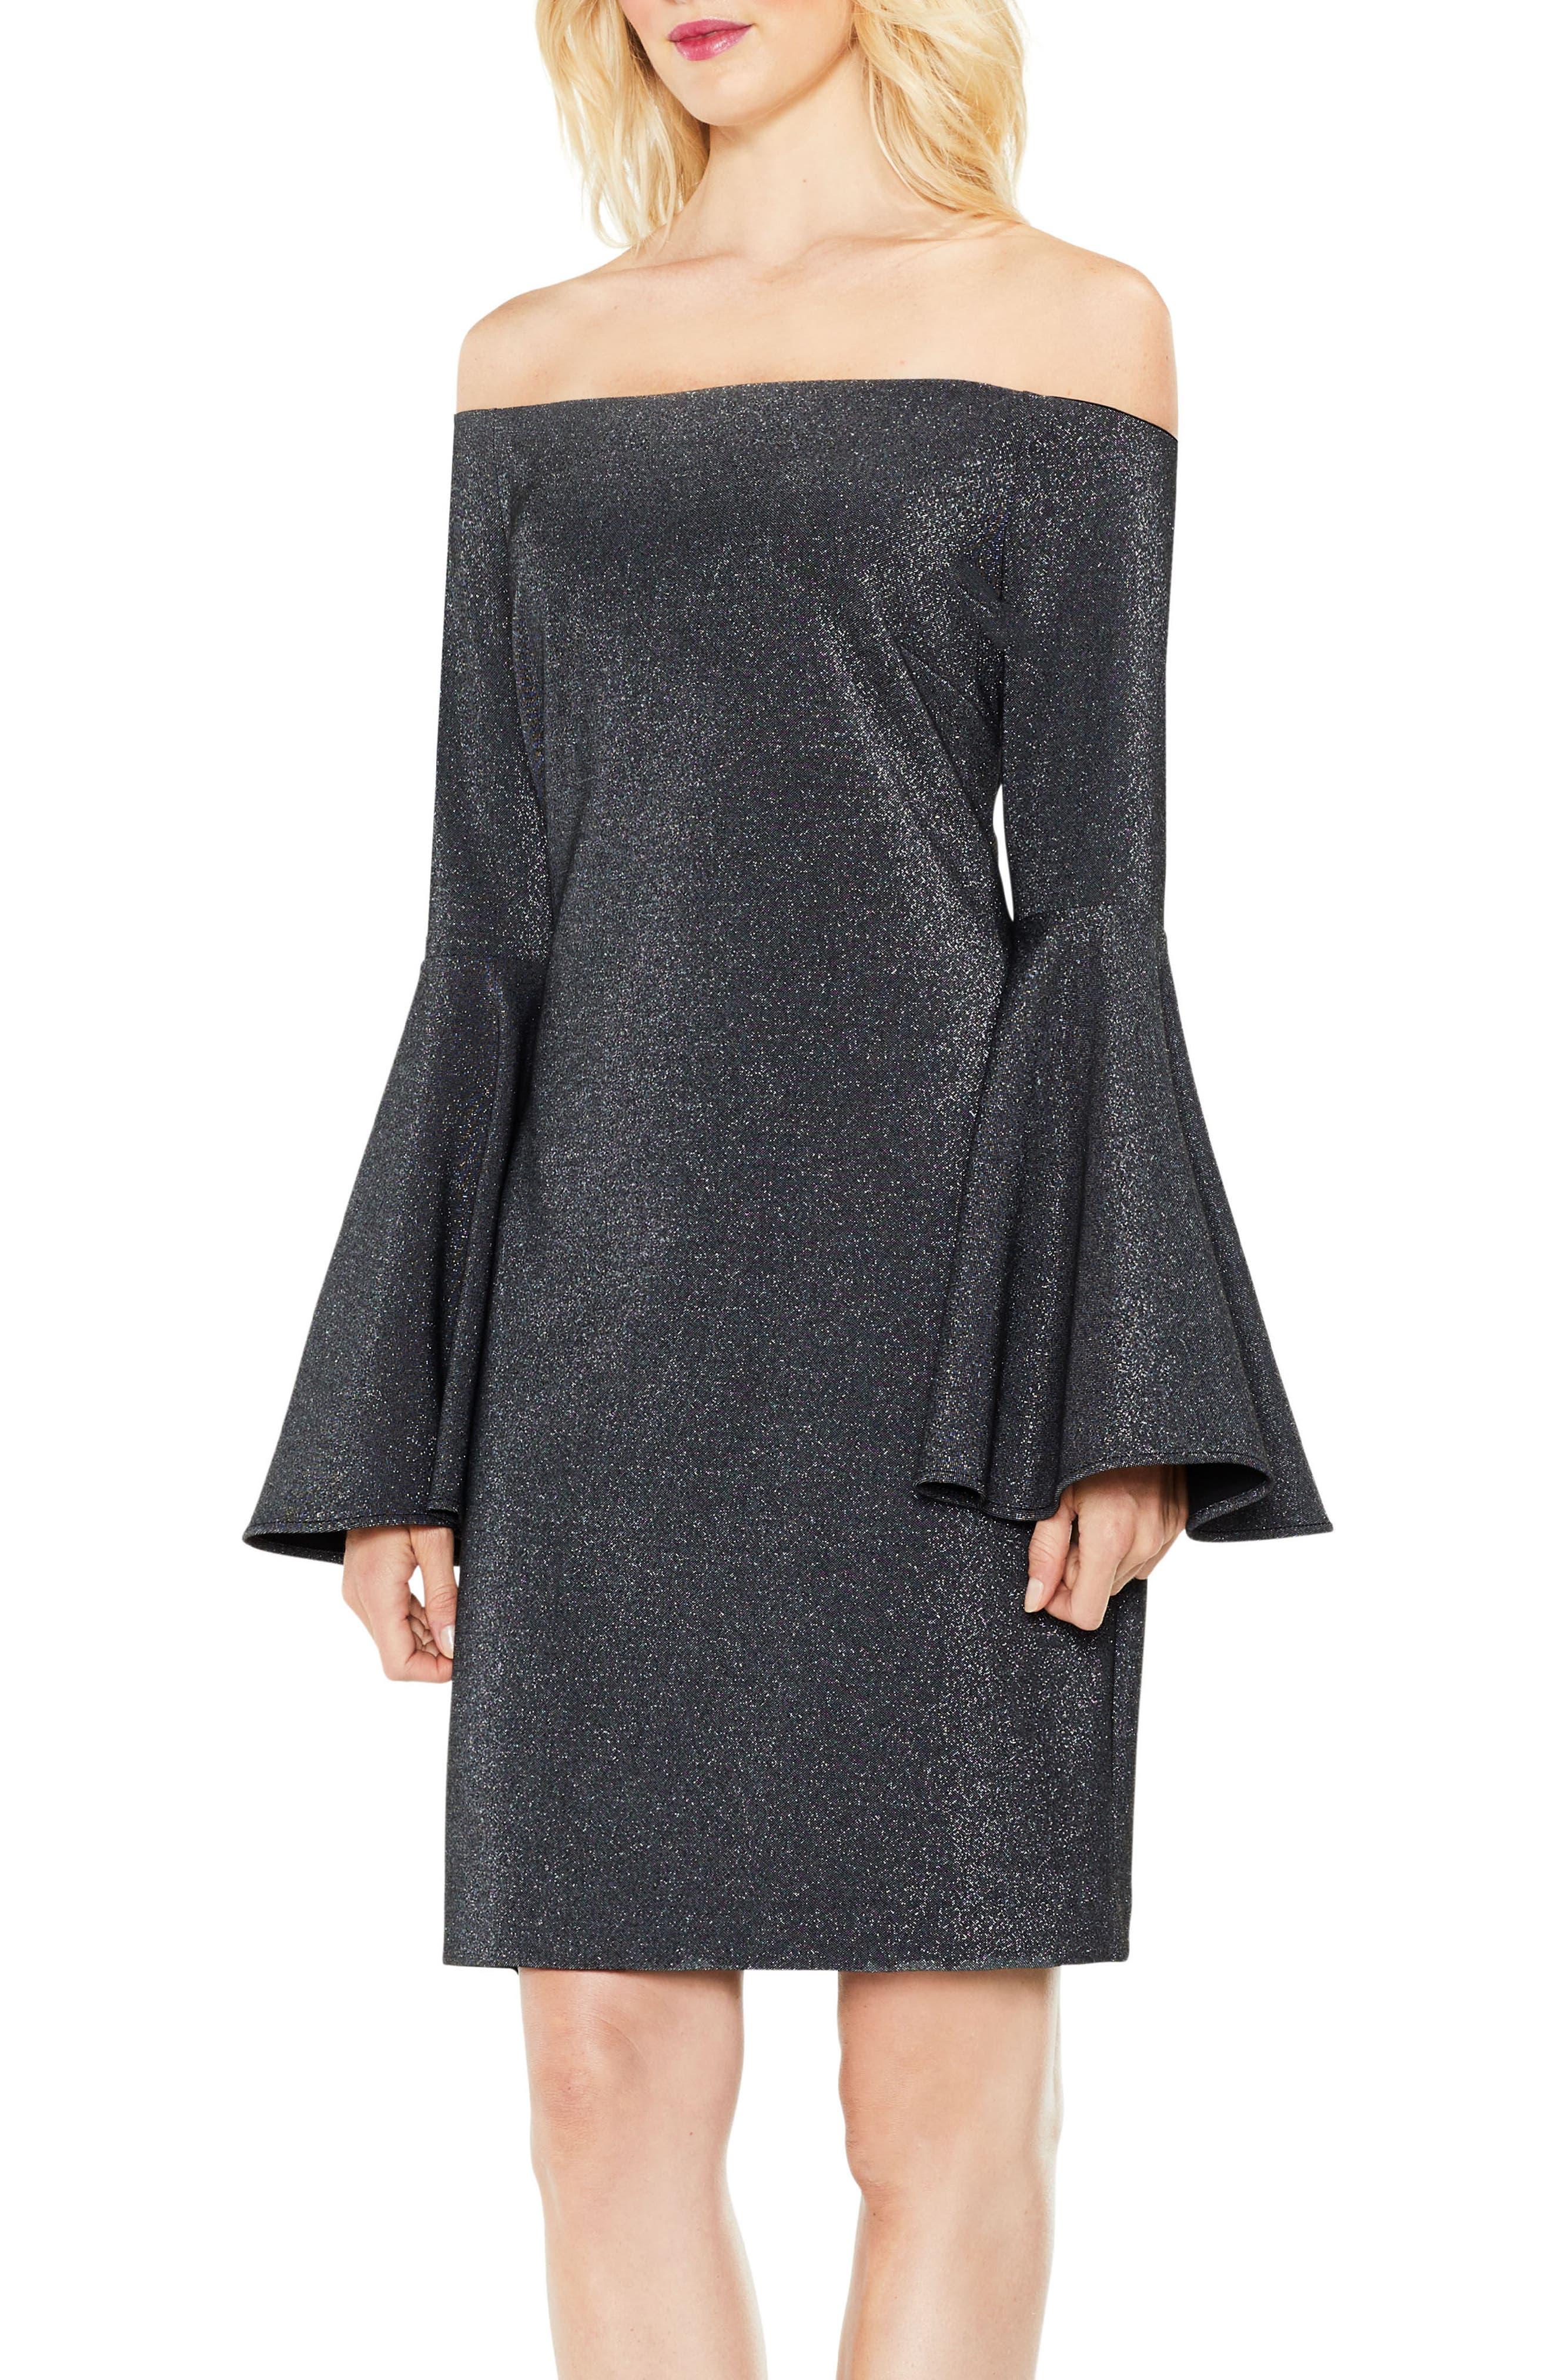 Off the Shoulder Metallic Knit Dress,                             Alternate thumbnail 3, color,                             006